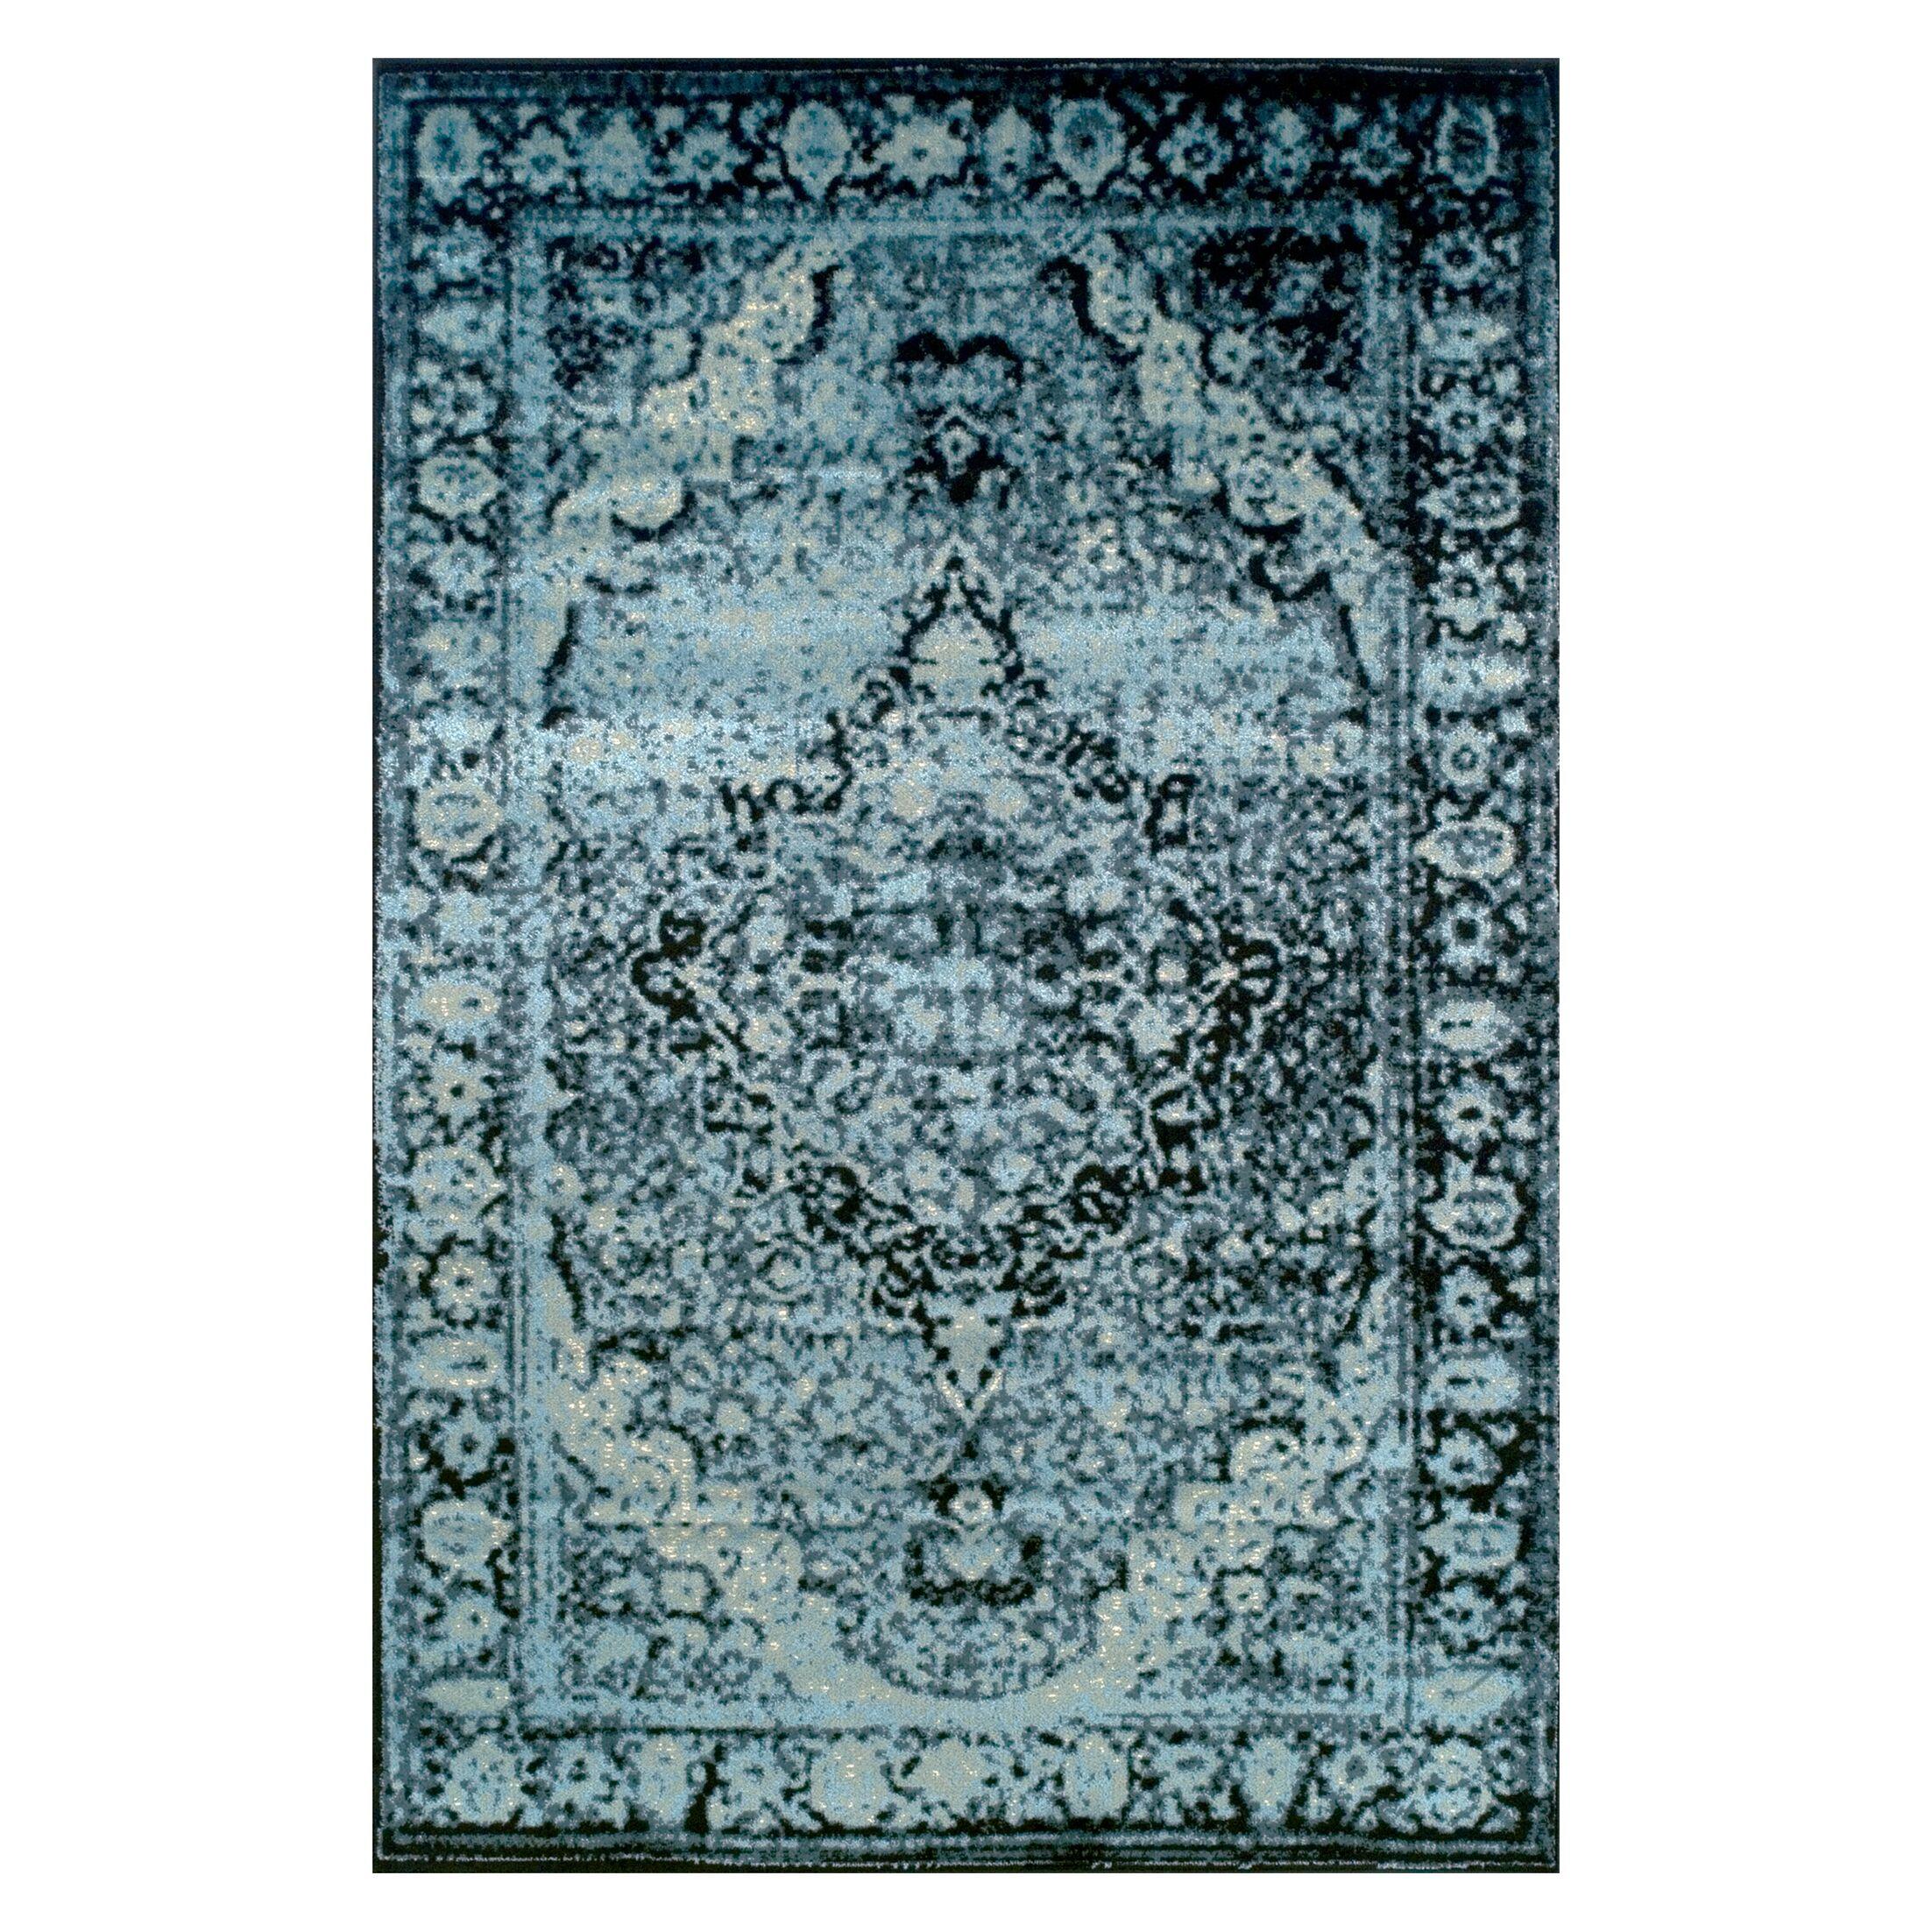 Sanders Midnight Blue/Black Area Rug Rug Size: Rectangle 8' x 10'